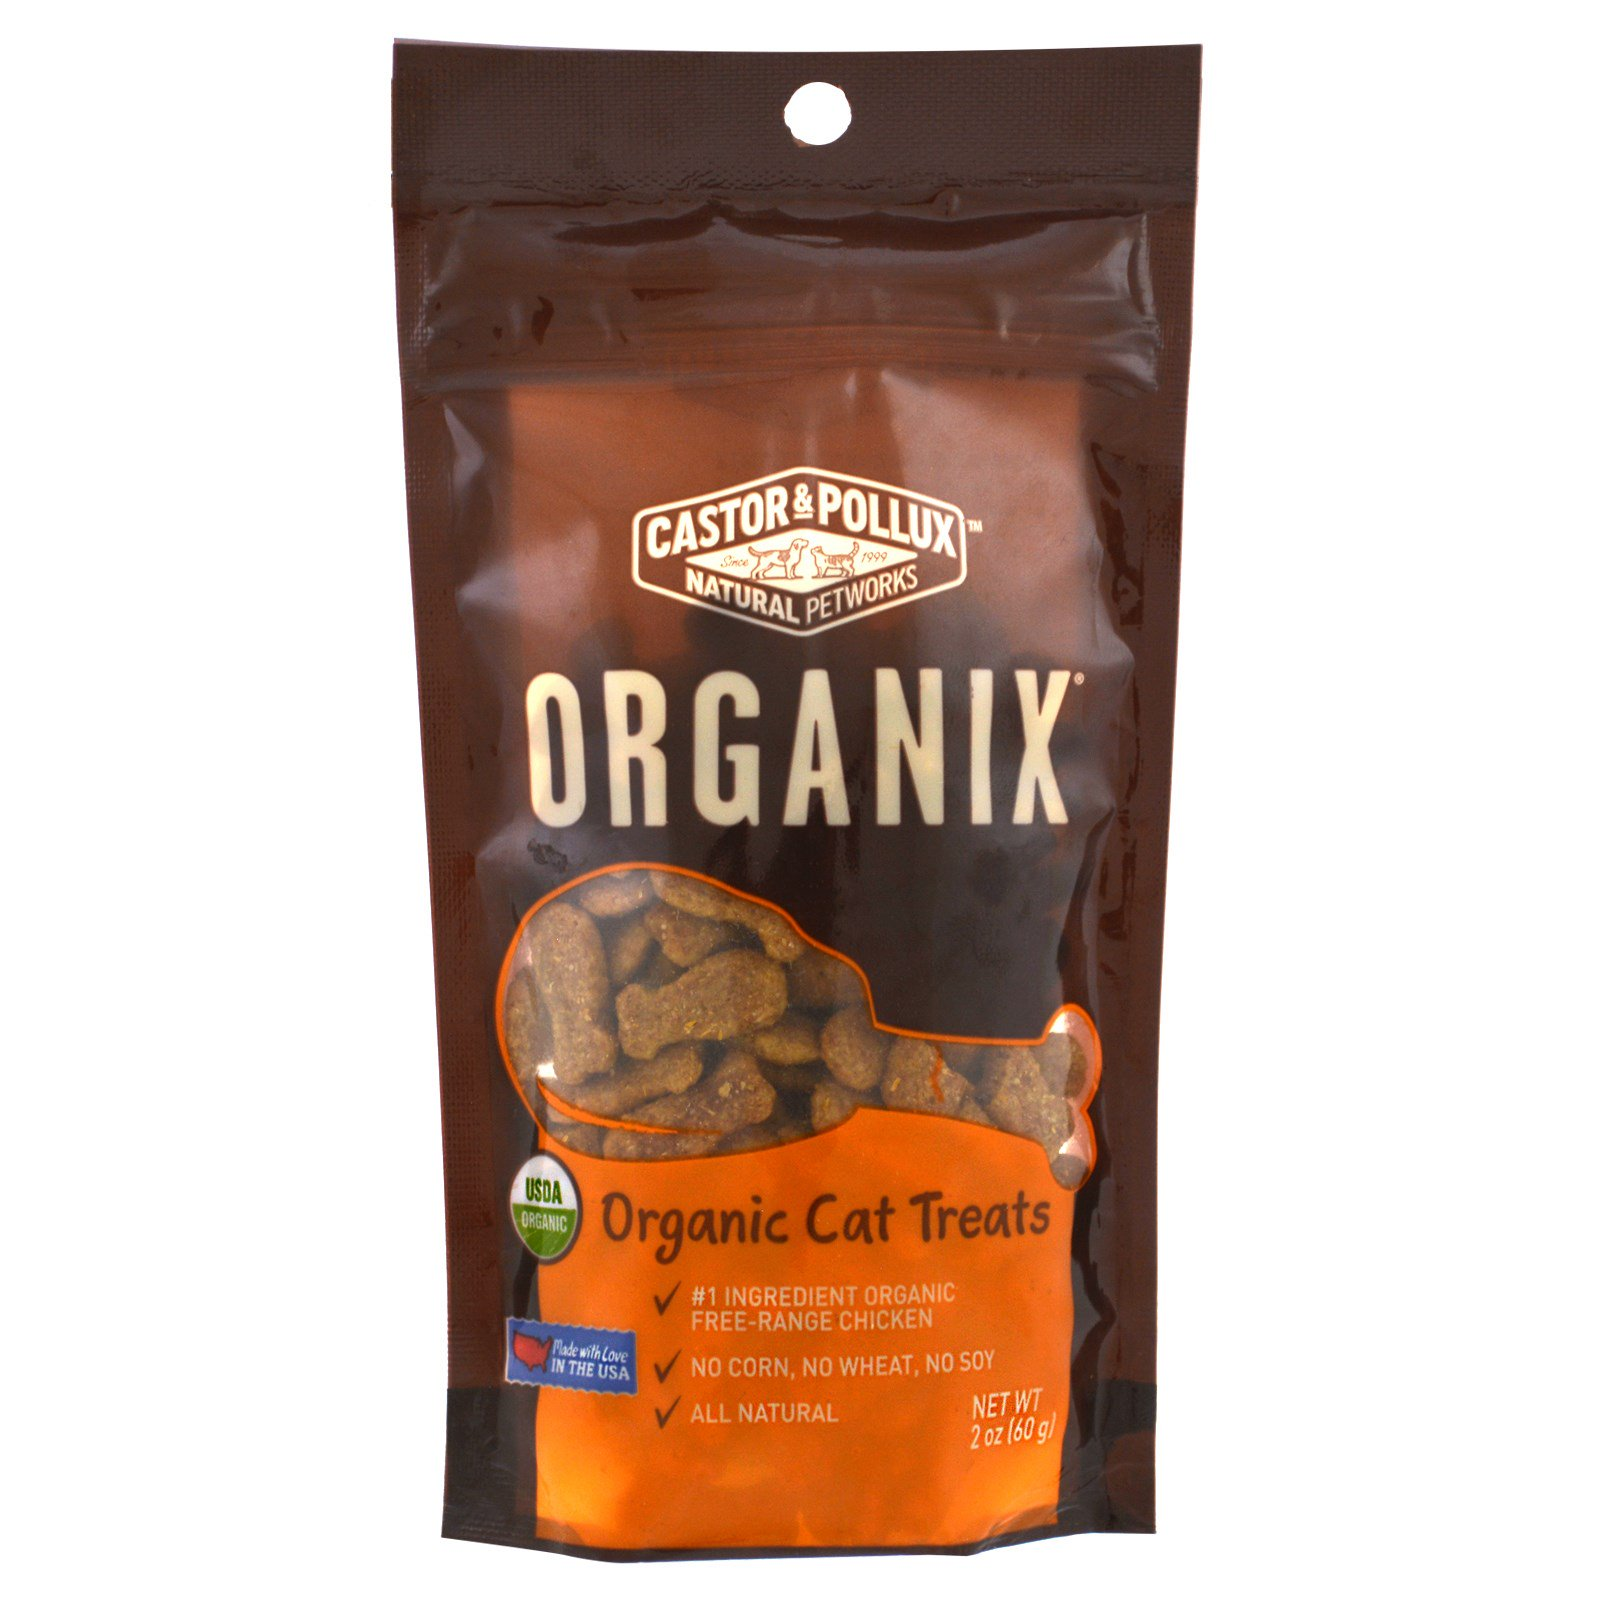 Castor Pollux Organix Organic Cat Treats Organic Chicken Flavor